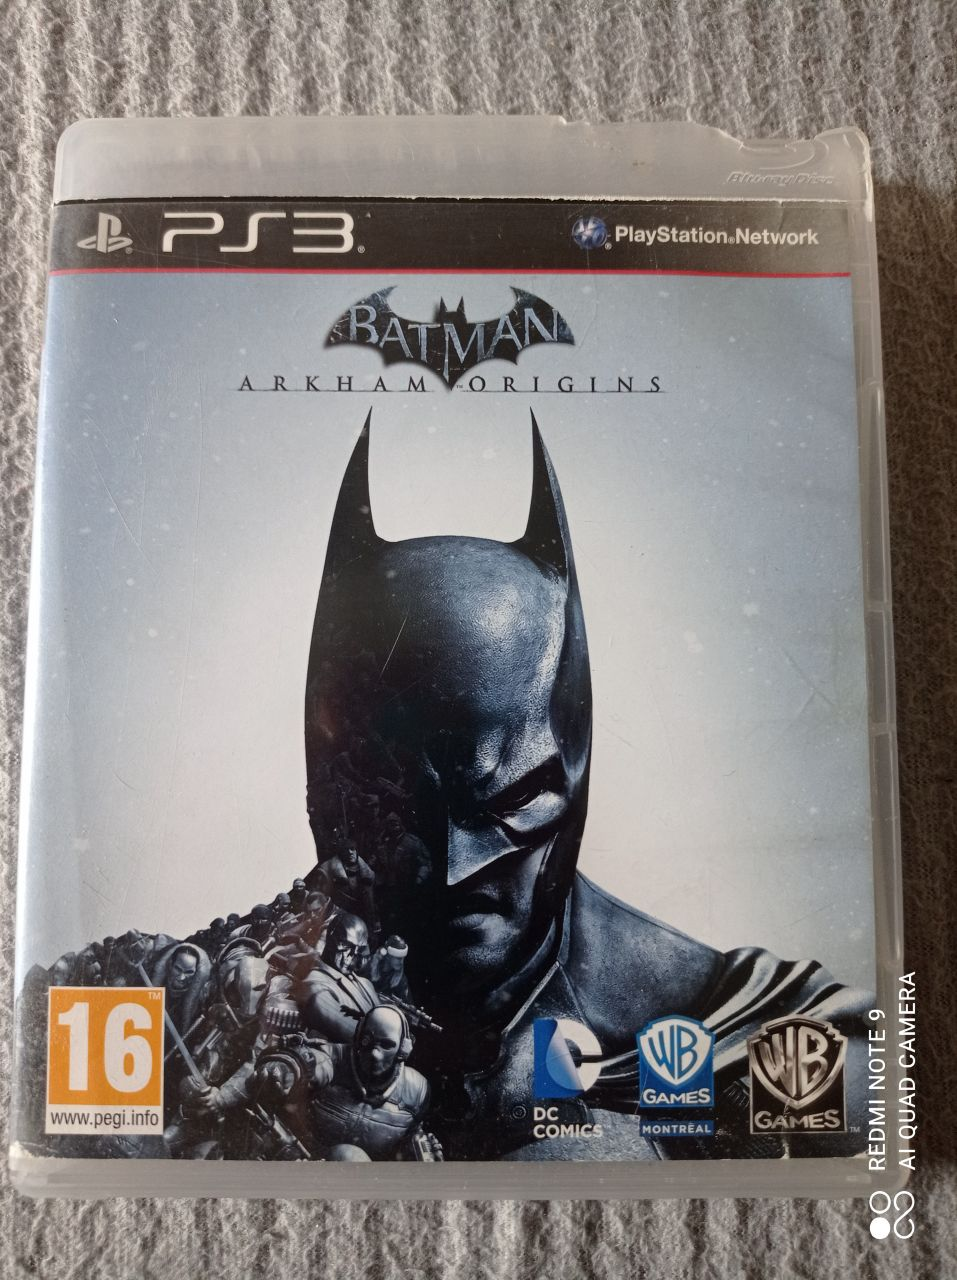 Image article Sony - Playstation 3 - Batman Arkham origins